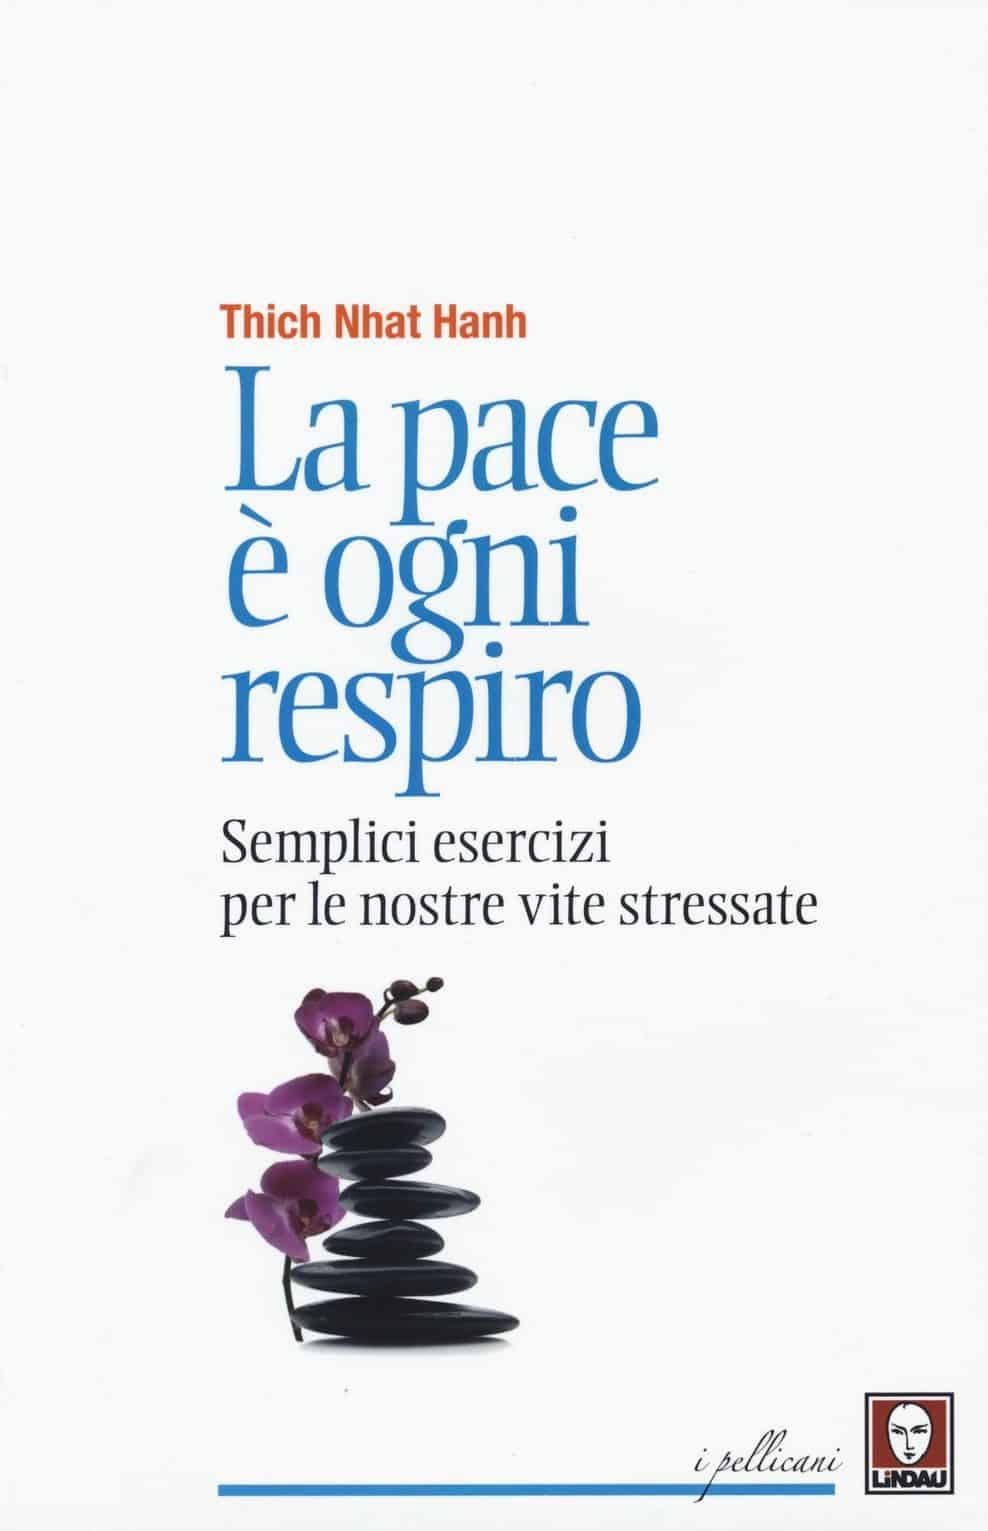 La pace è ogni respiro | Libri consigliati | Osteopata Genova Francesco Bertino